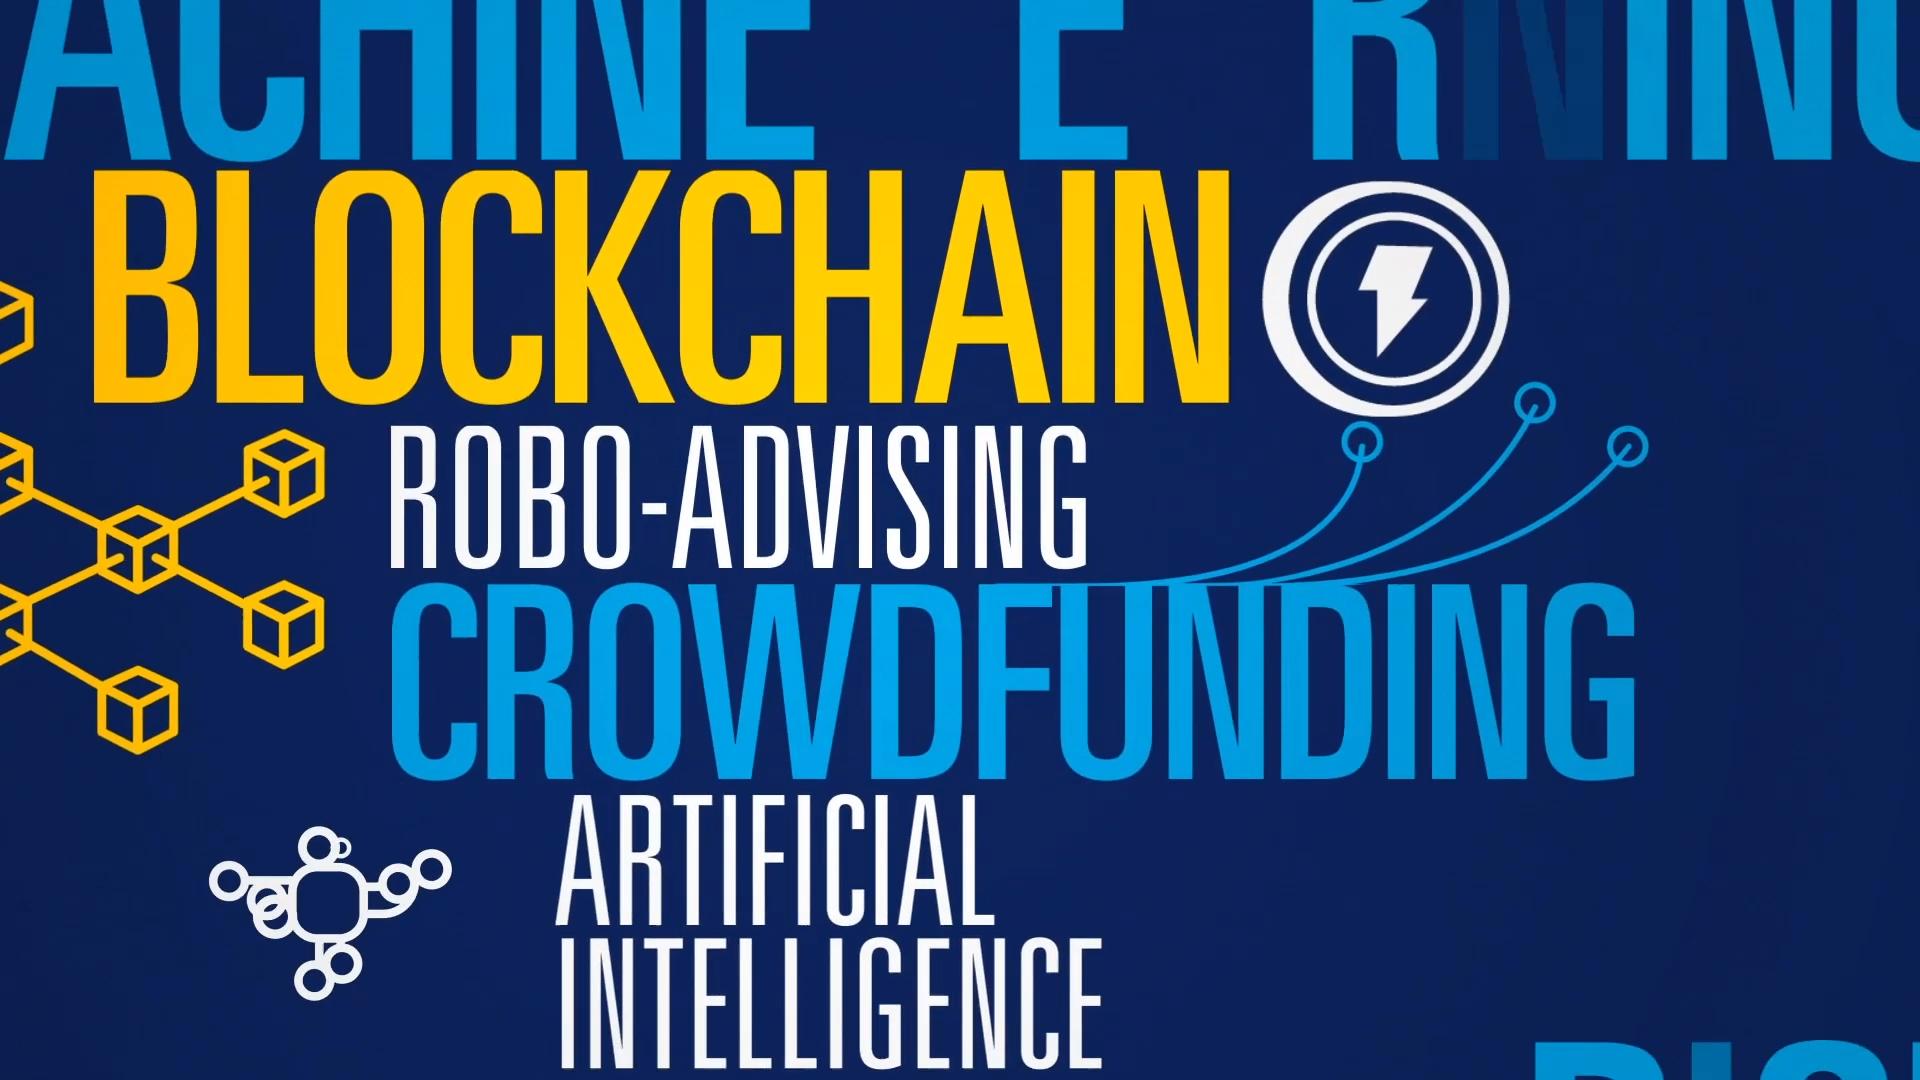 Fintech Blockchain image